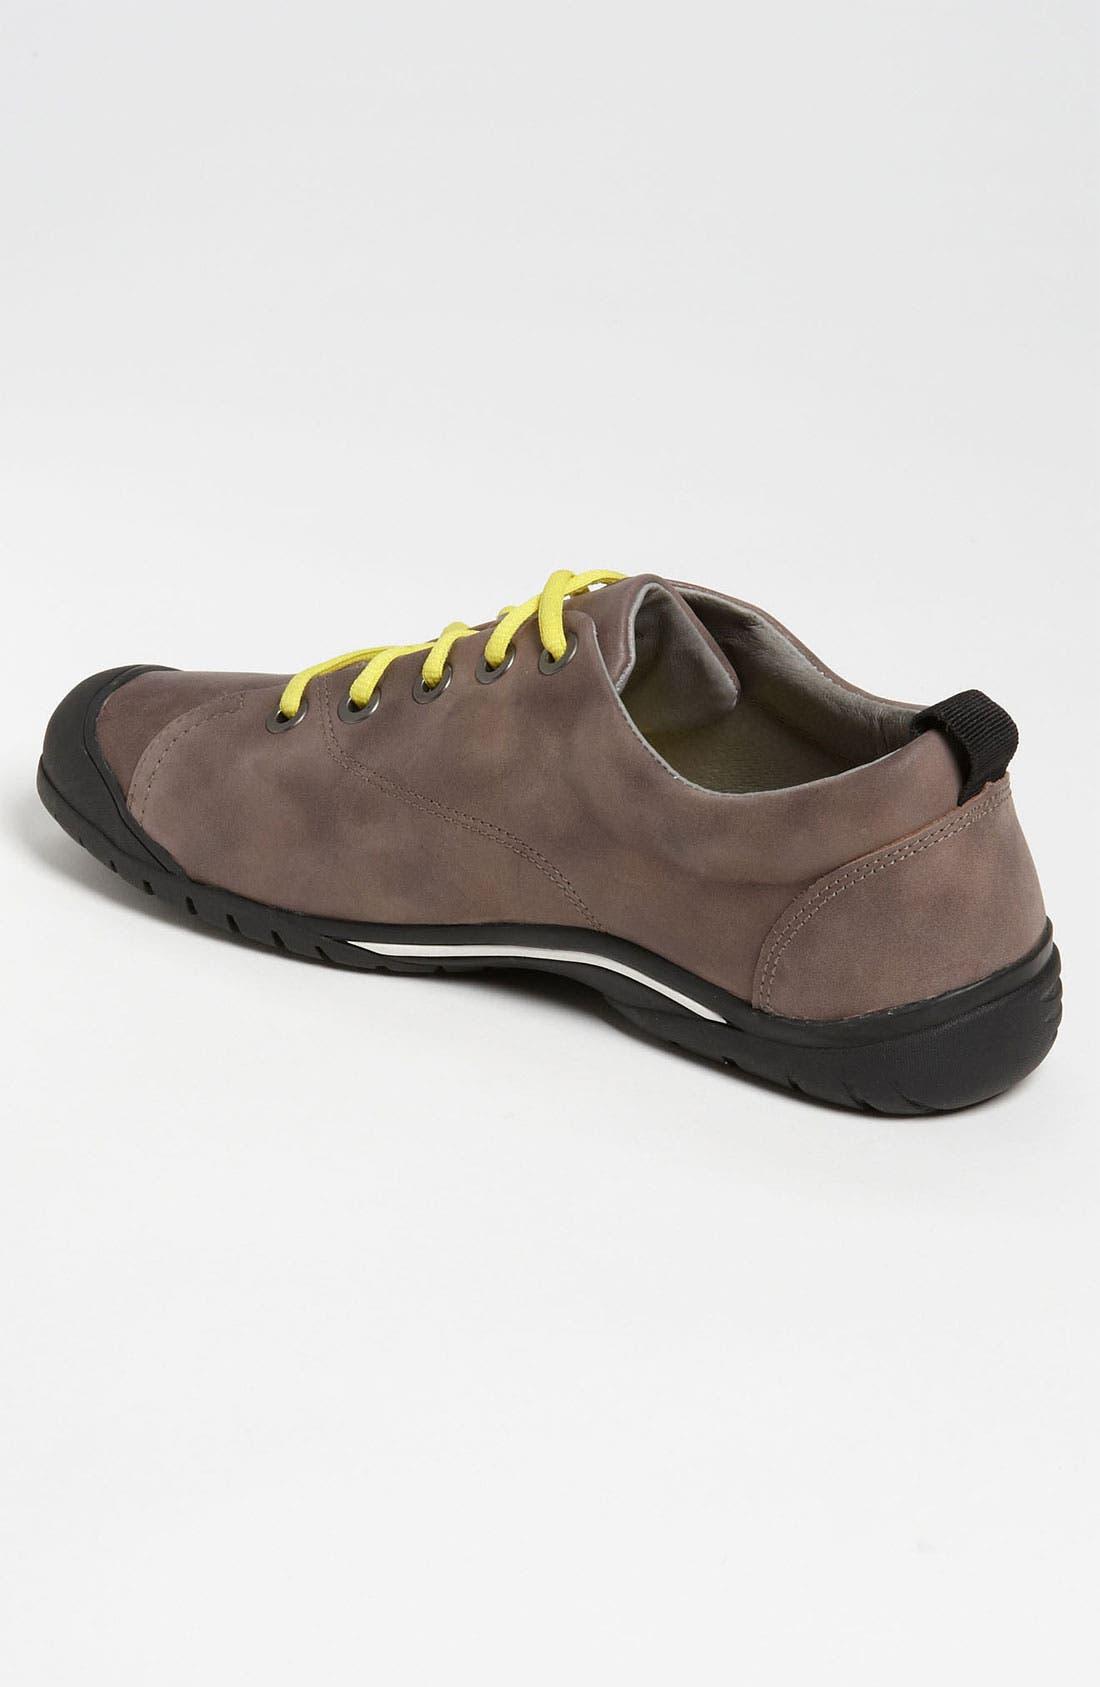 Alternate Image 2  - Kenneth Cole Reaction 'High Volt-Age' Sneaker